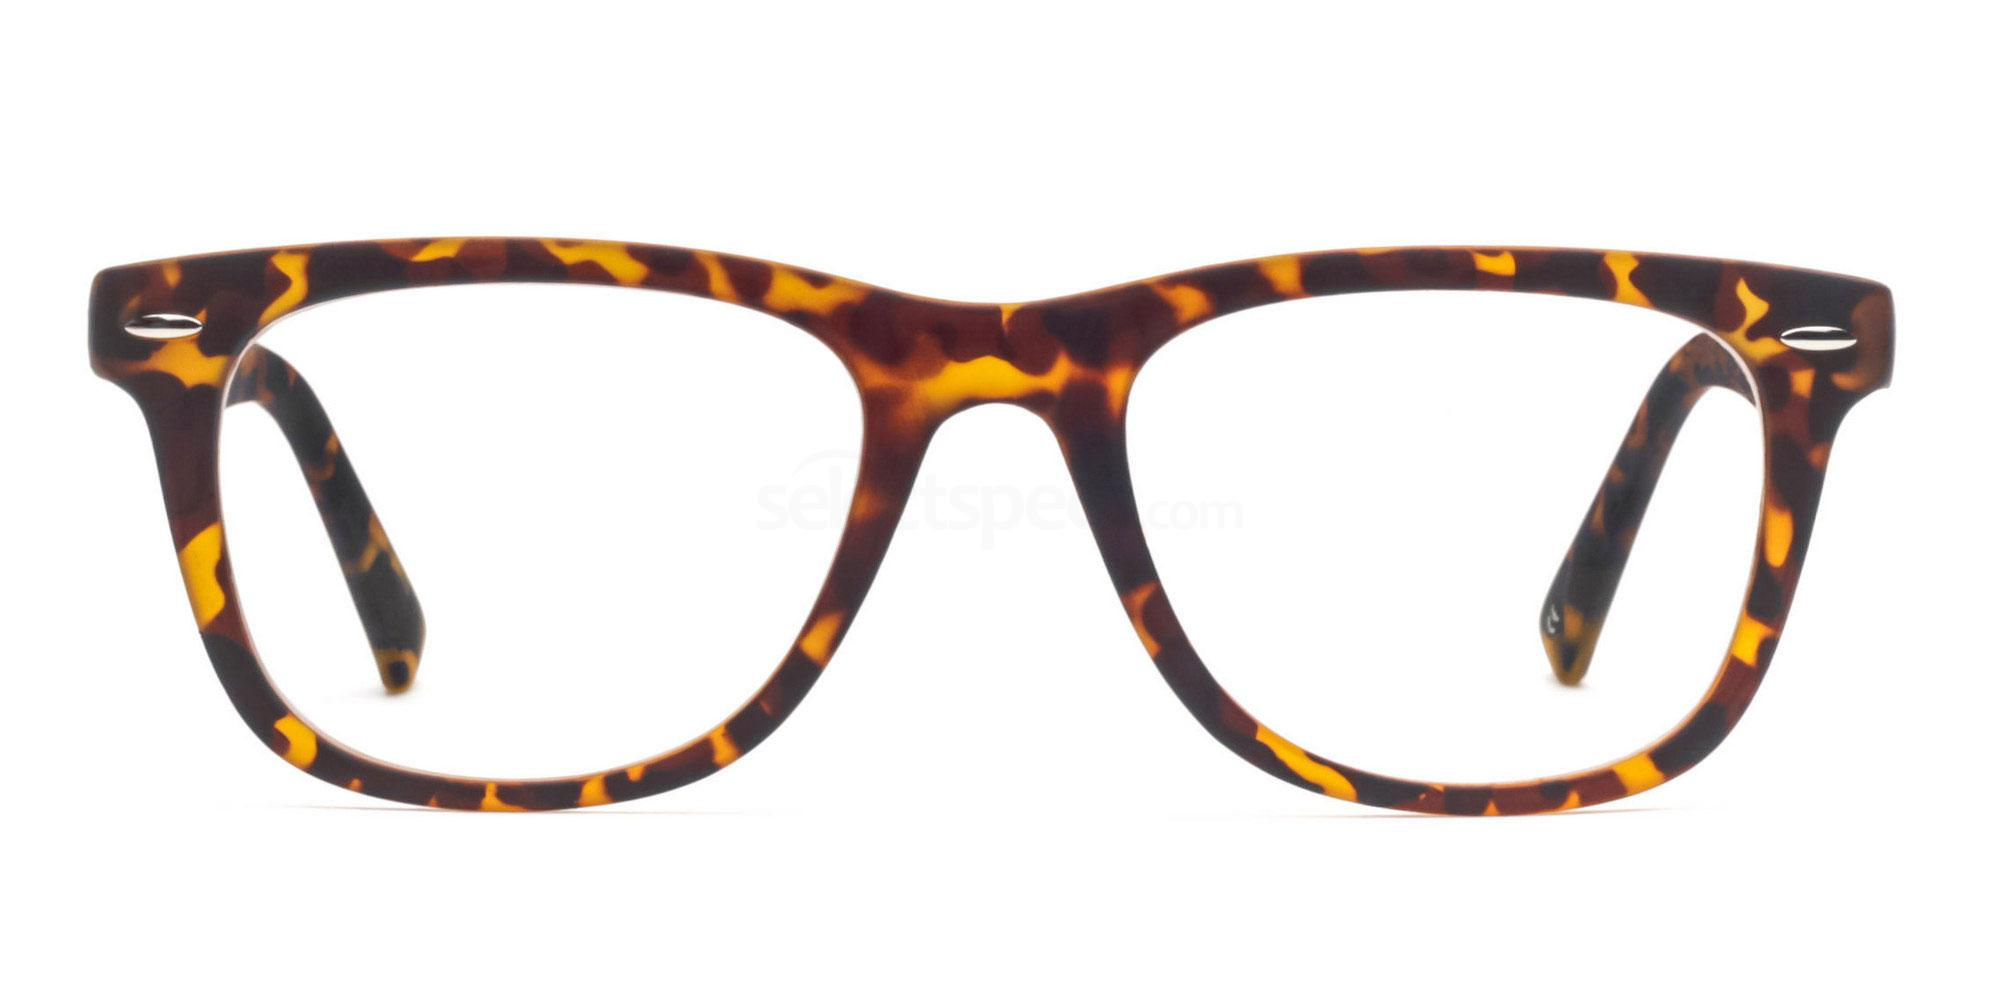 C9 8121 - Tortoise Glasses, Savannah